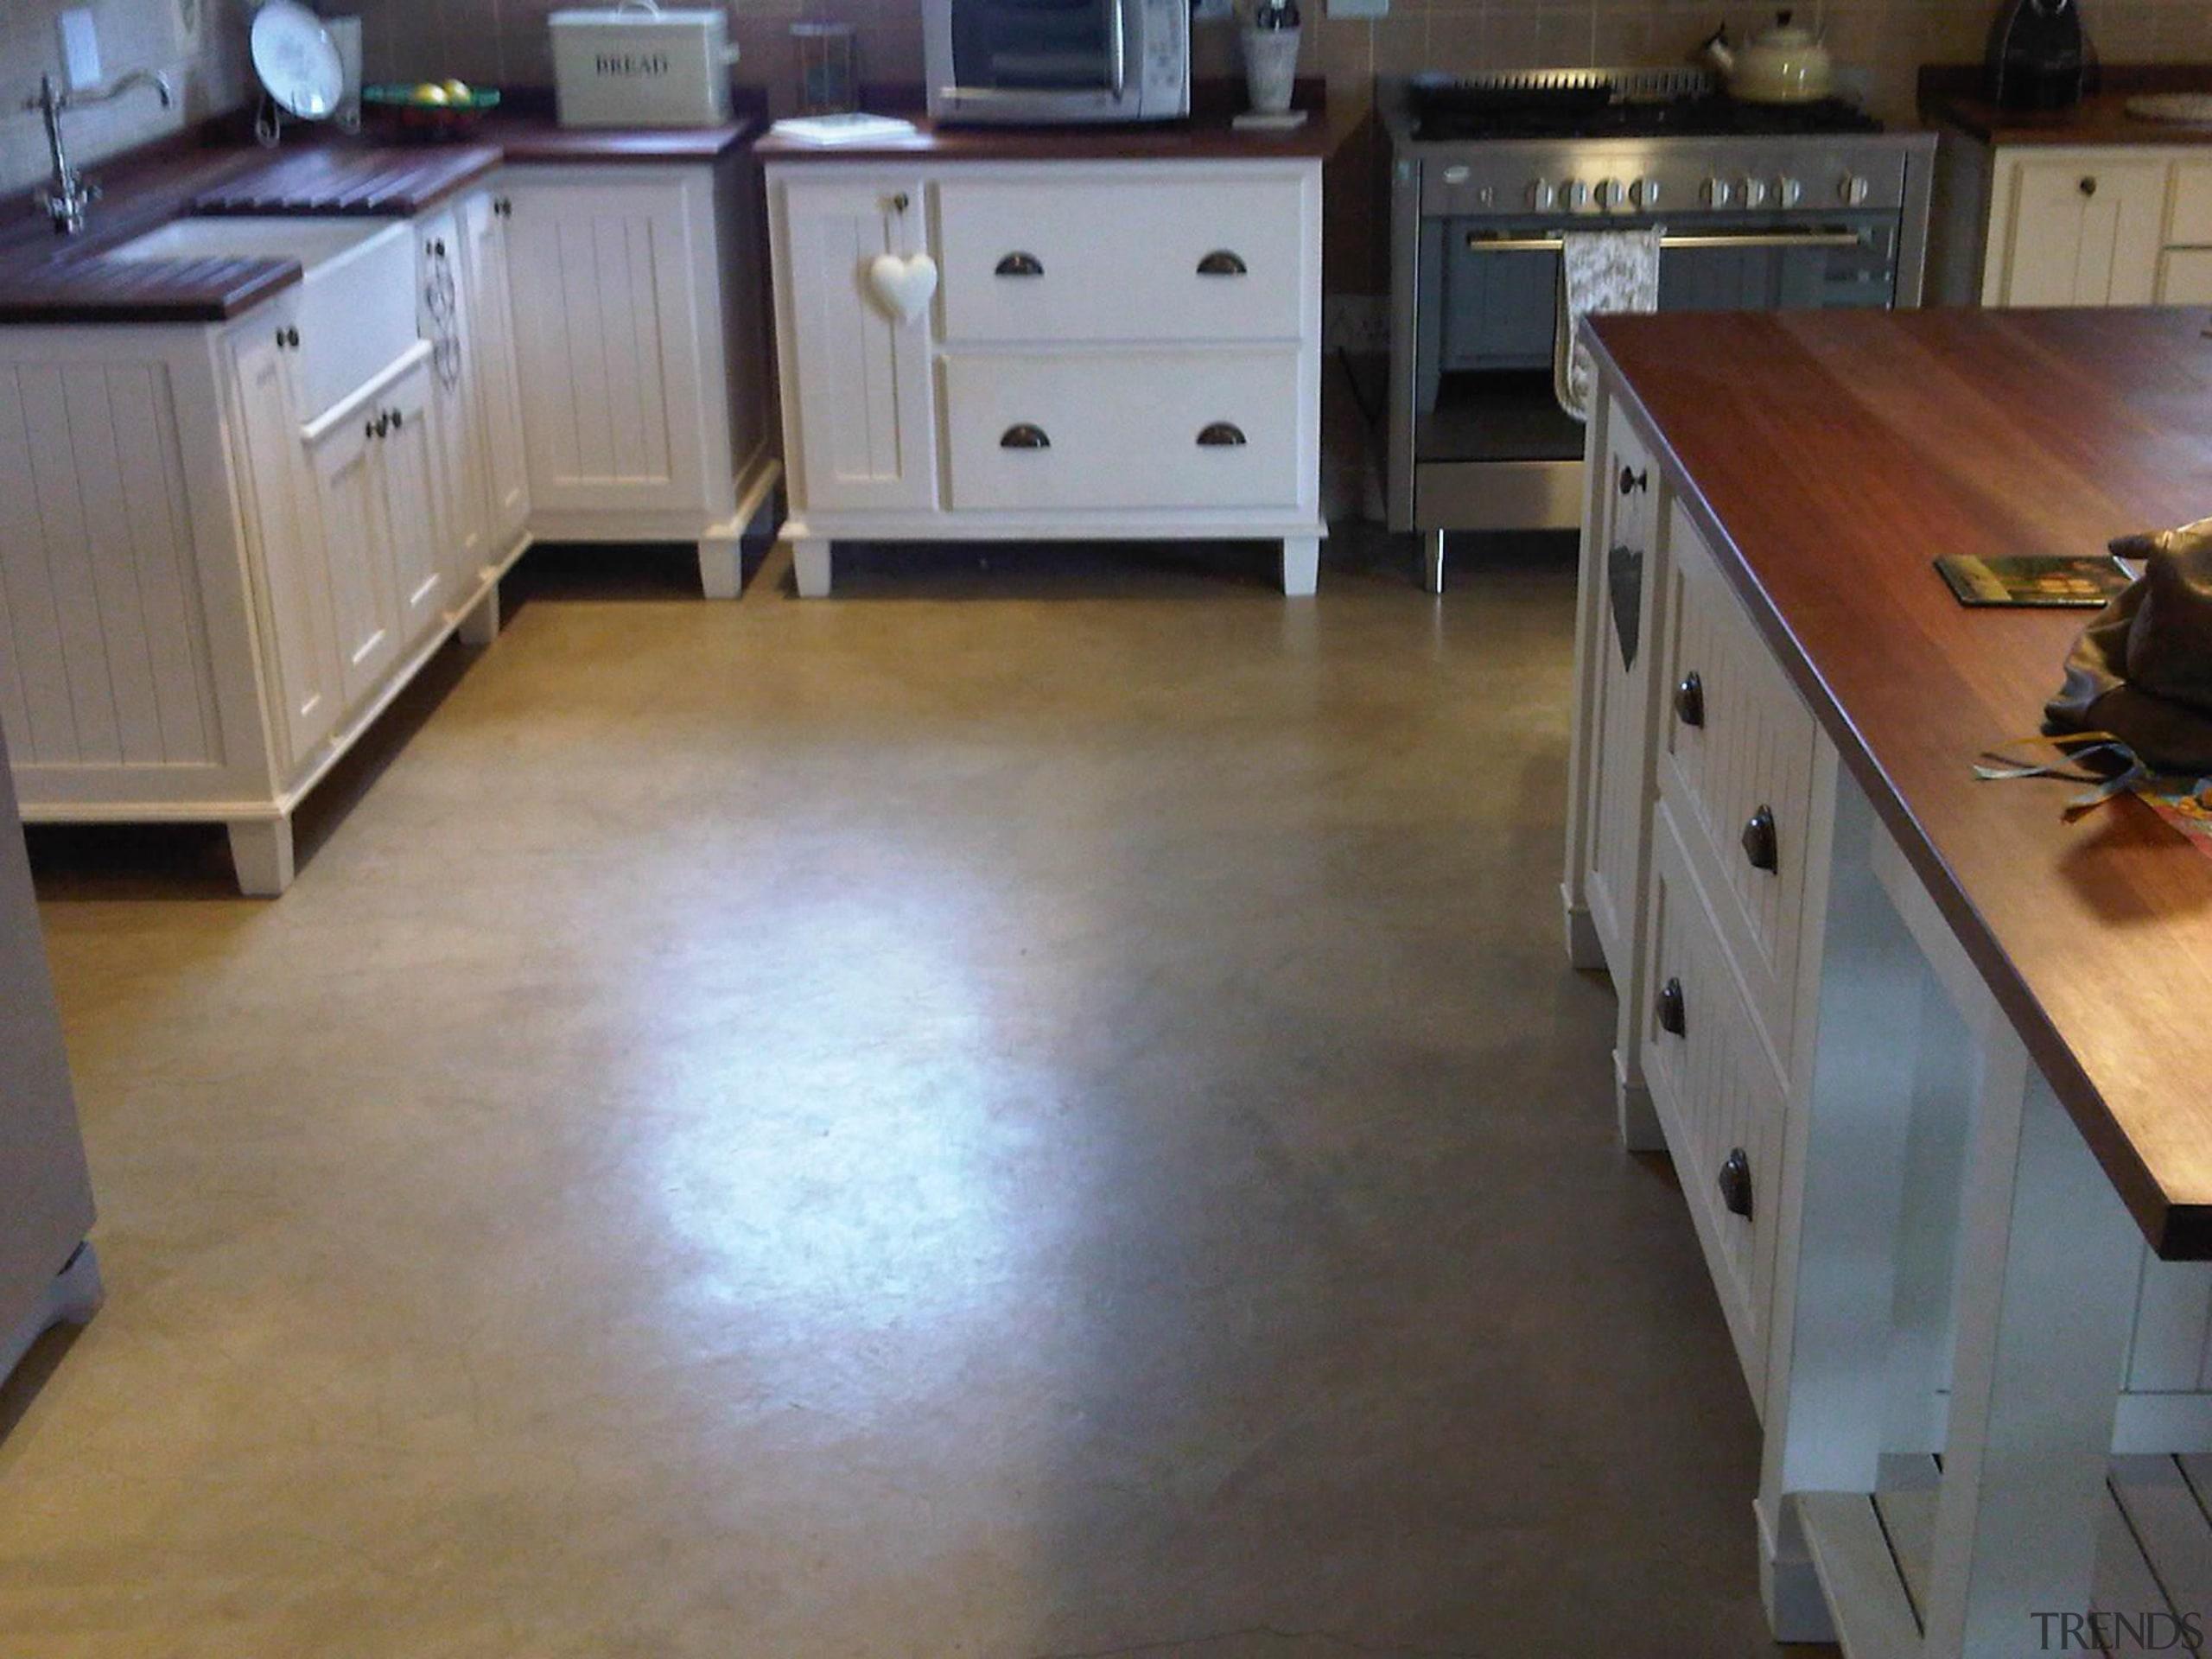 Colour hardener  19 - Colour_hardener__19 - countertop countertop, floor, flooring, hardwood, kitchen, laminate flooring, tile, wood, wood flooring, wood stain, gray